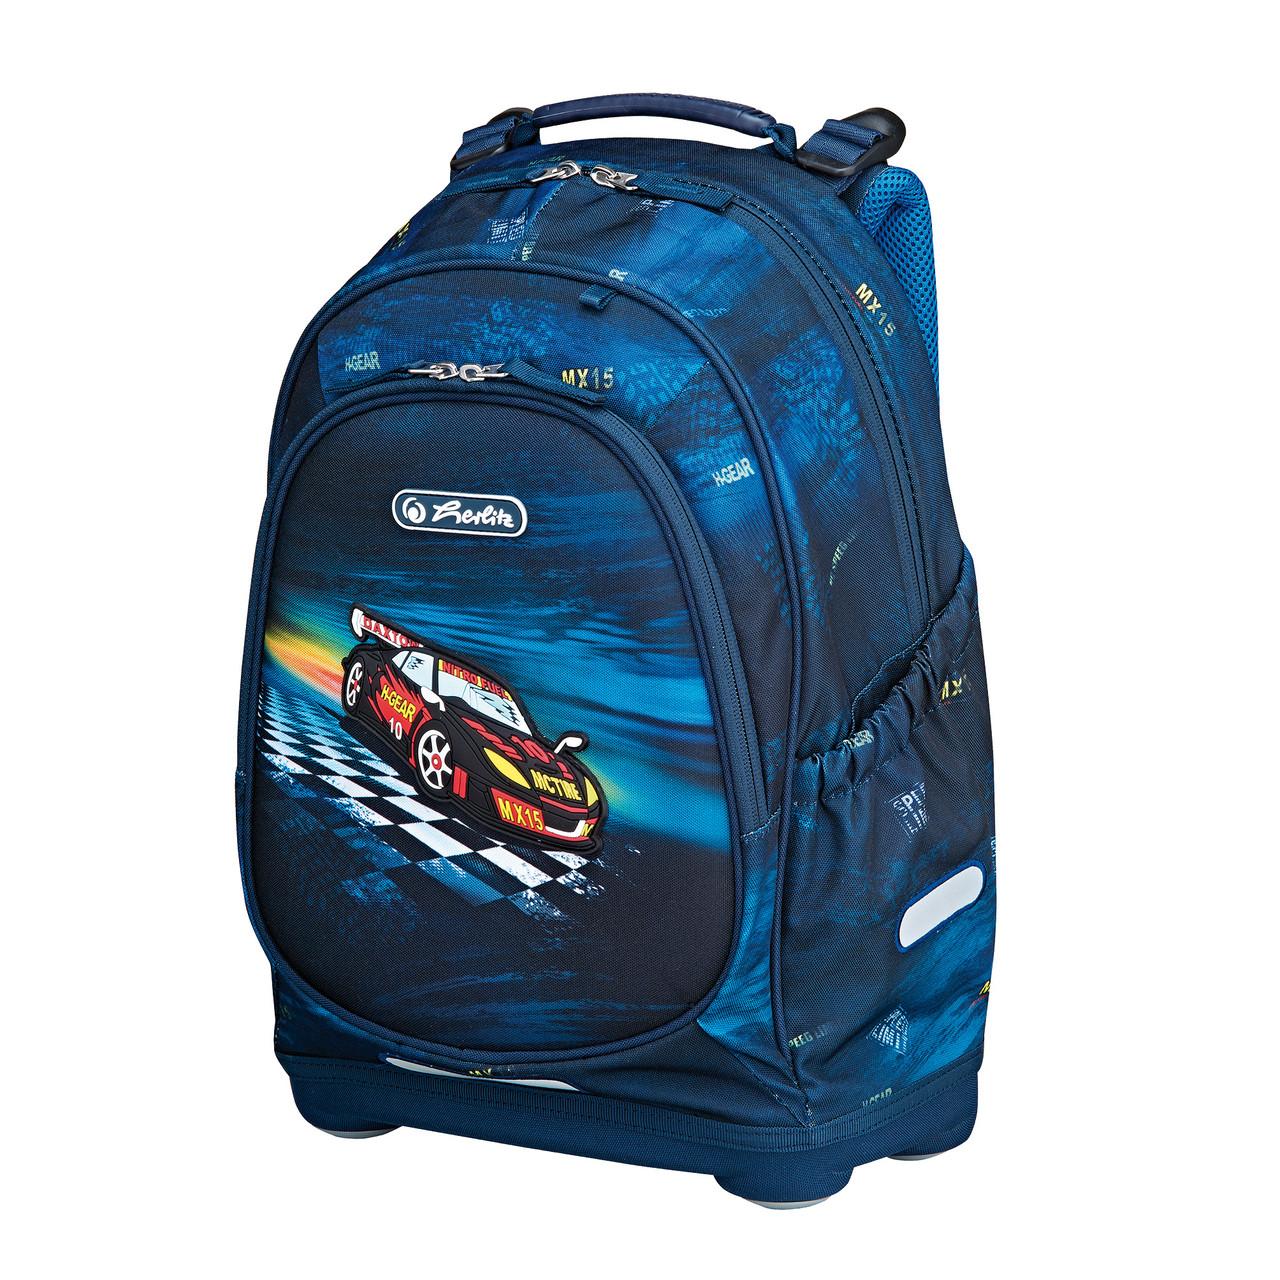 Рюкзак школьный Herlitz BLISS Super Racer (50008100)